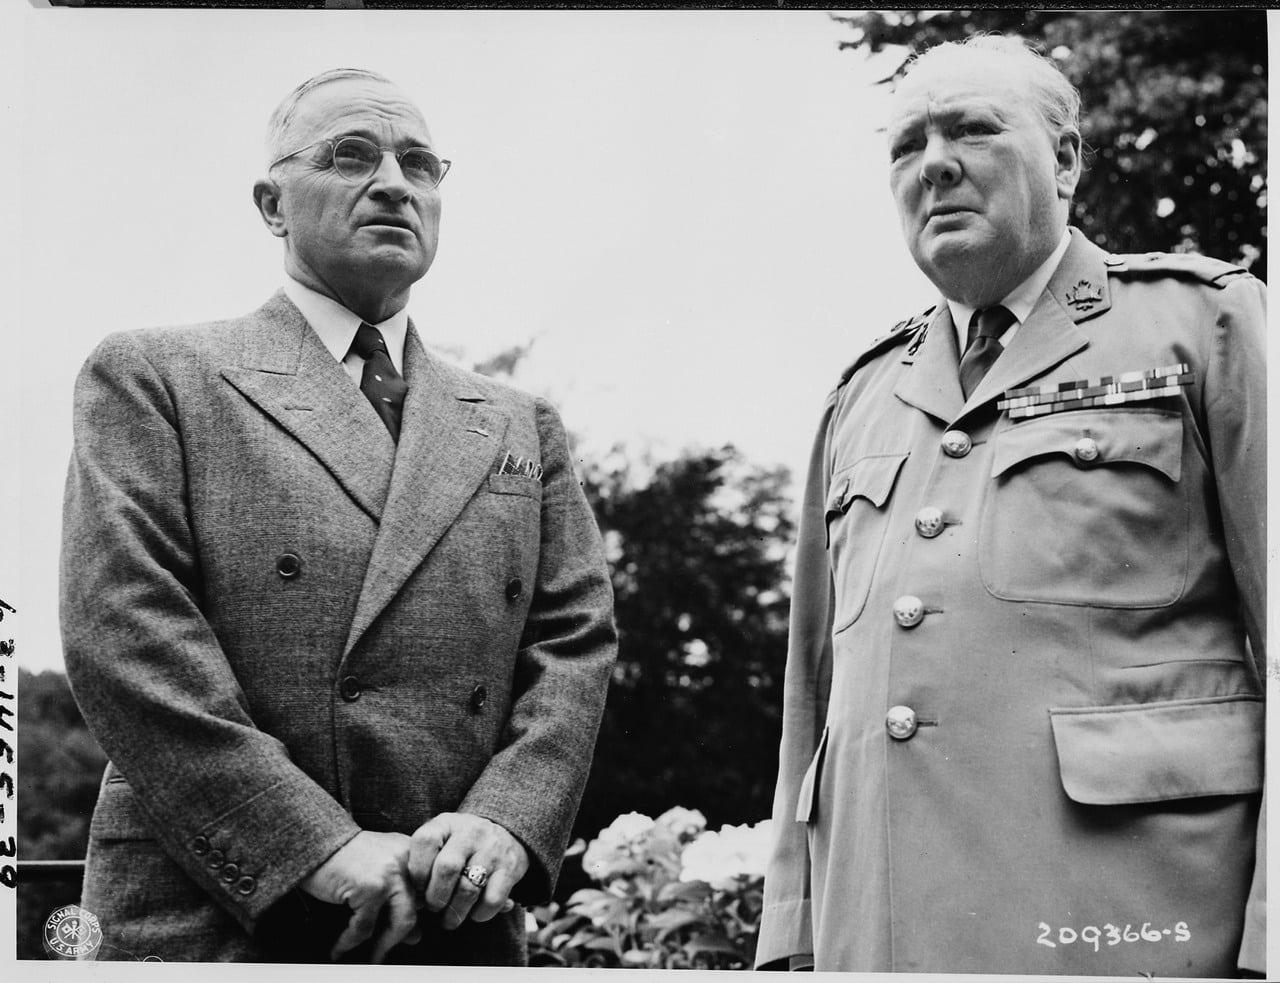 The Potsdam Conference - July 18th 1945 - Truman and Churchill meet at Churchill's Villa